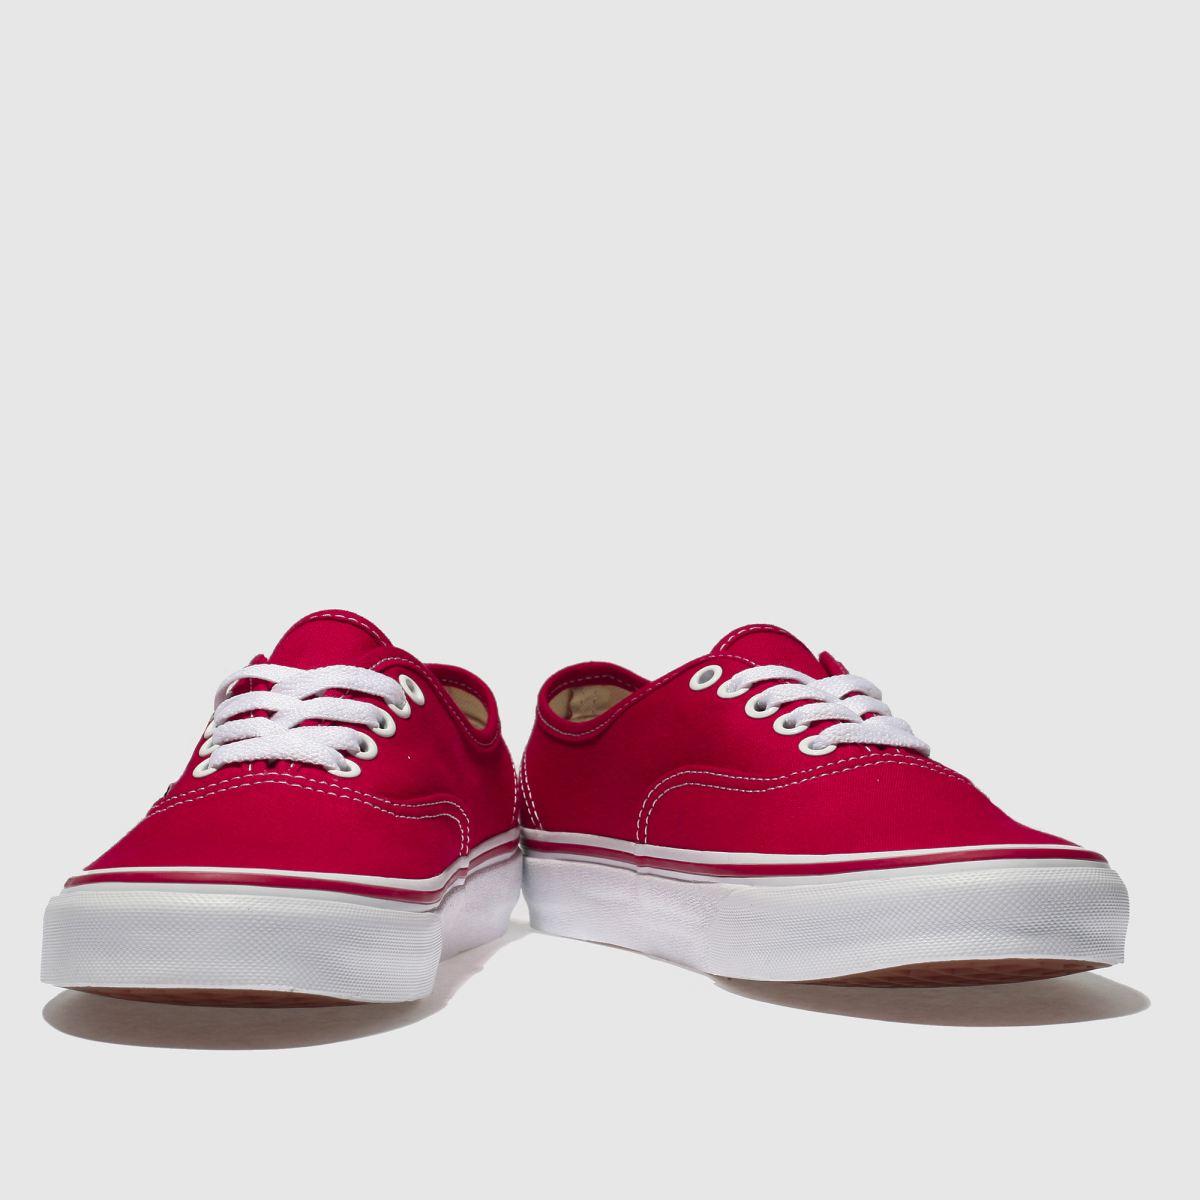 Damen Rot vans Authentic Canvas Sneaker | schuh Gute Qualität beliebte Schuhe